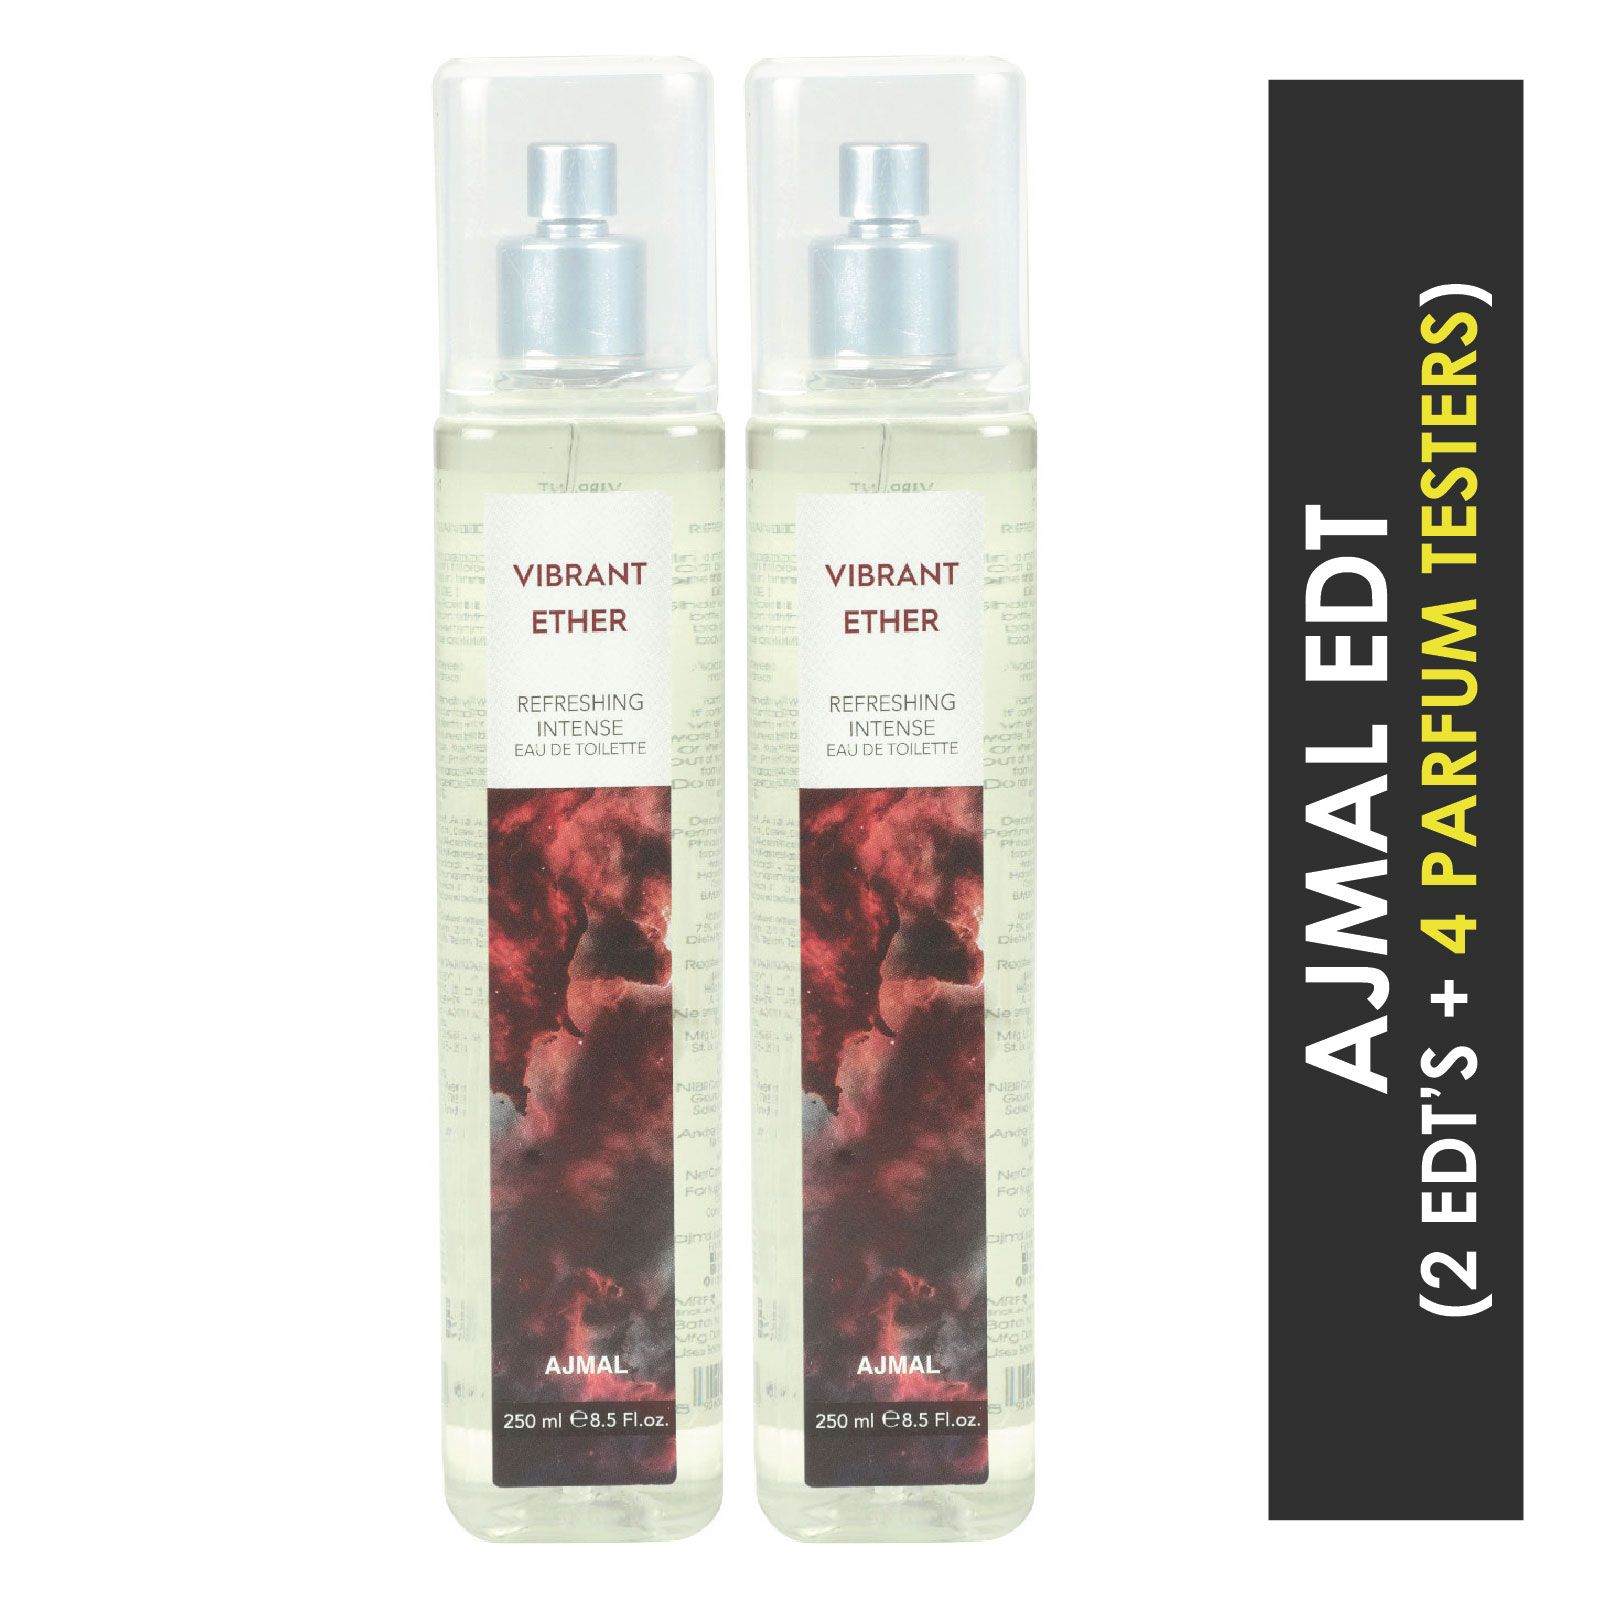 Ajmal | Ajmal Vibrant Ether EDT  pack of 2 each 250ml (Total 500ML) for Unisex + 4 Parfum Testers